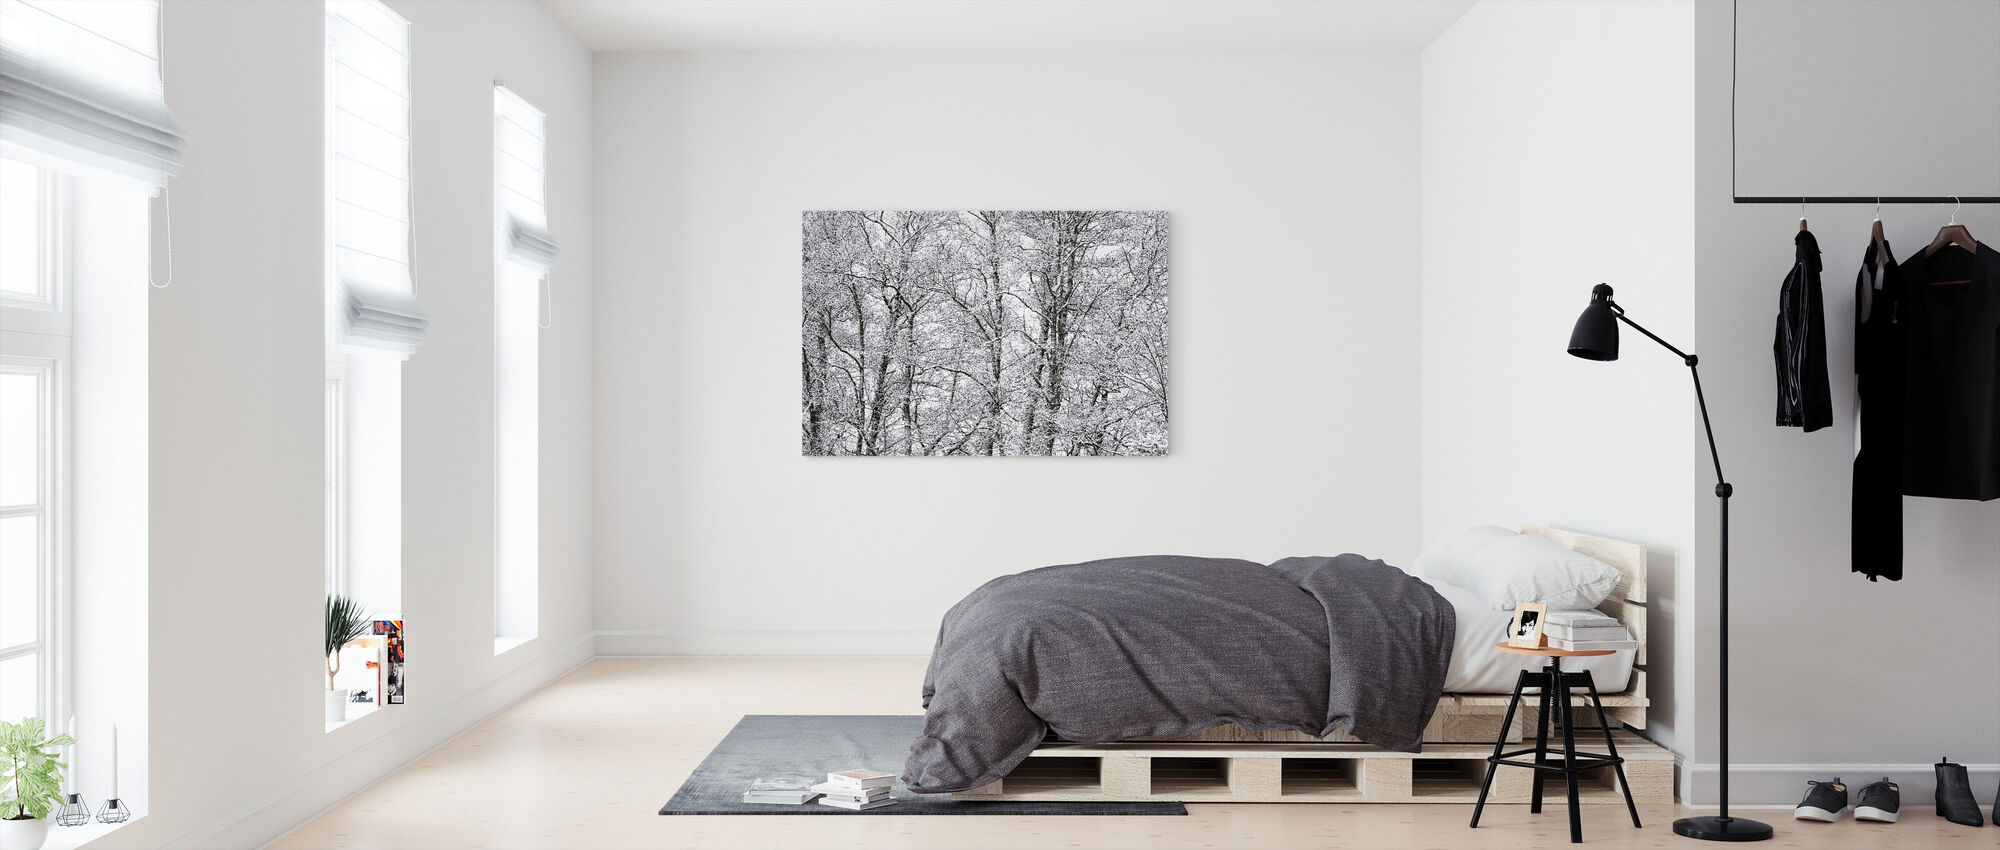 Puut - Canvastaulu - Makuuhuone